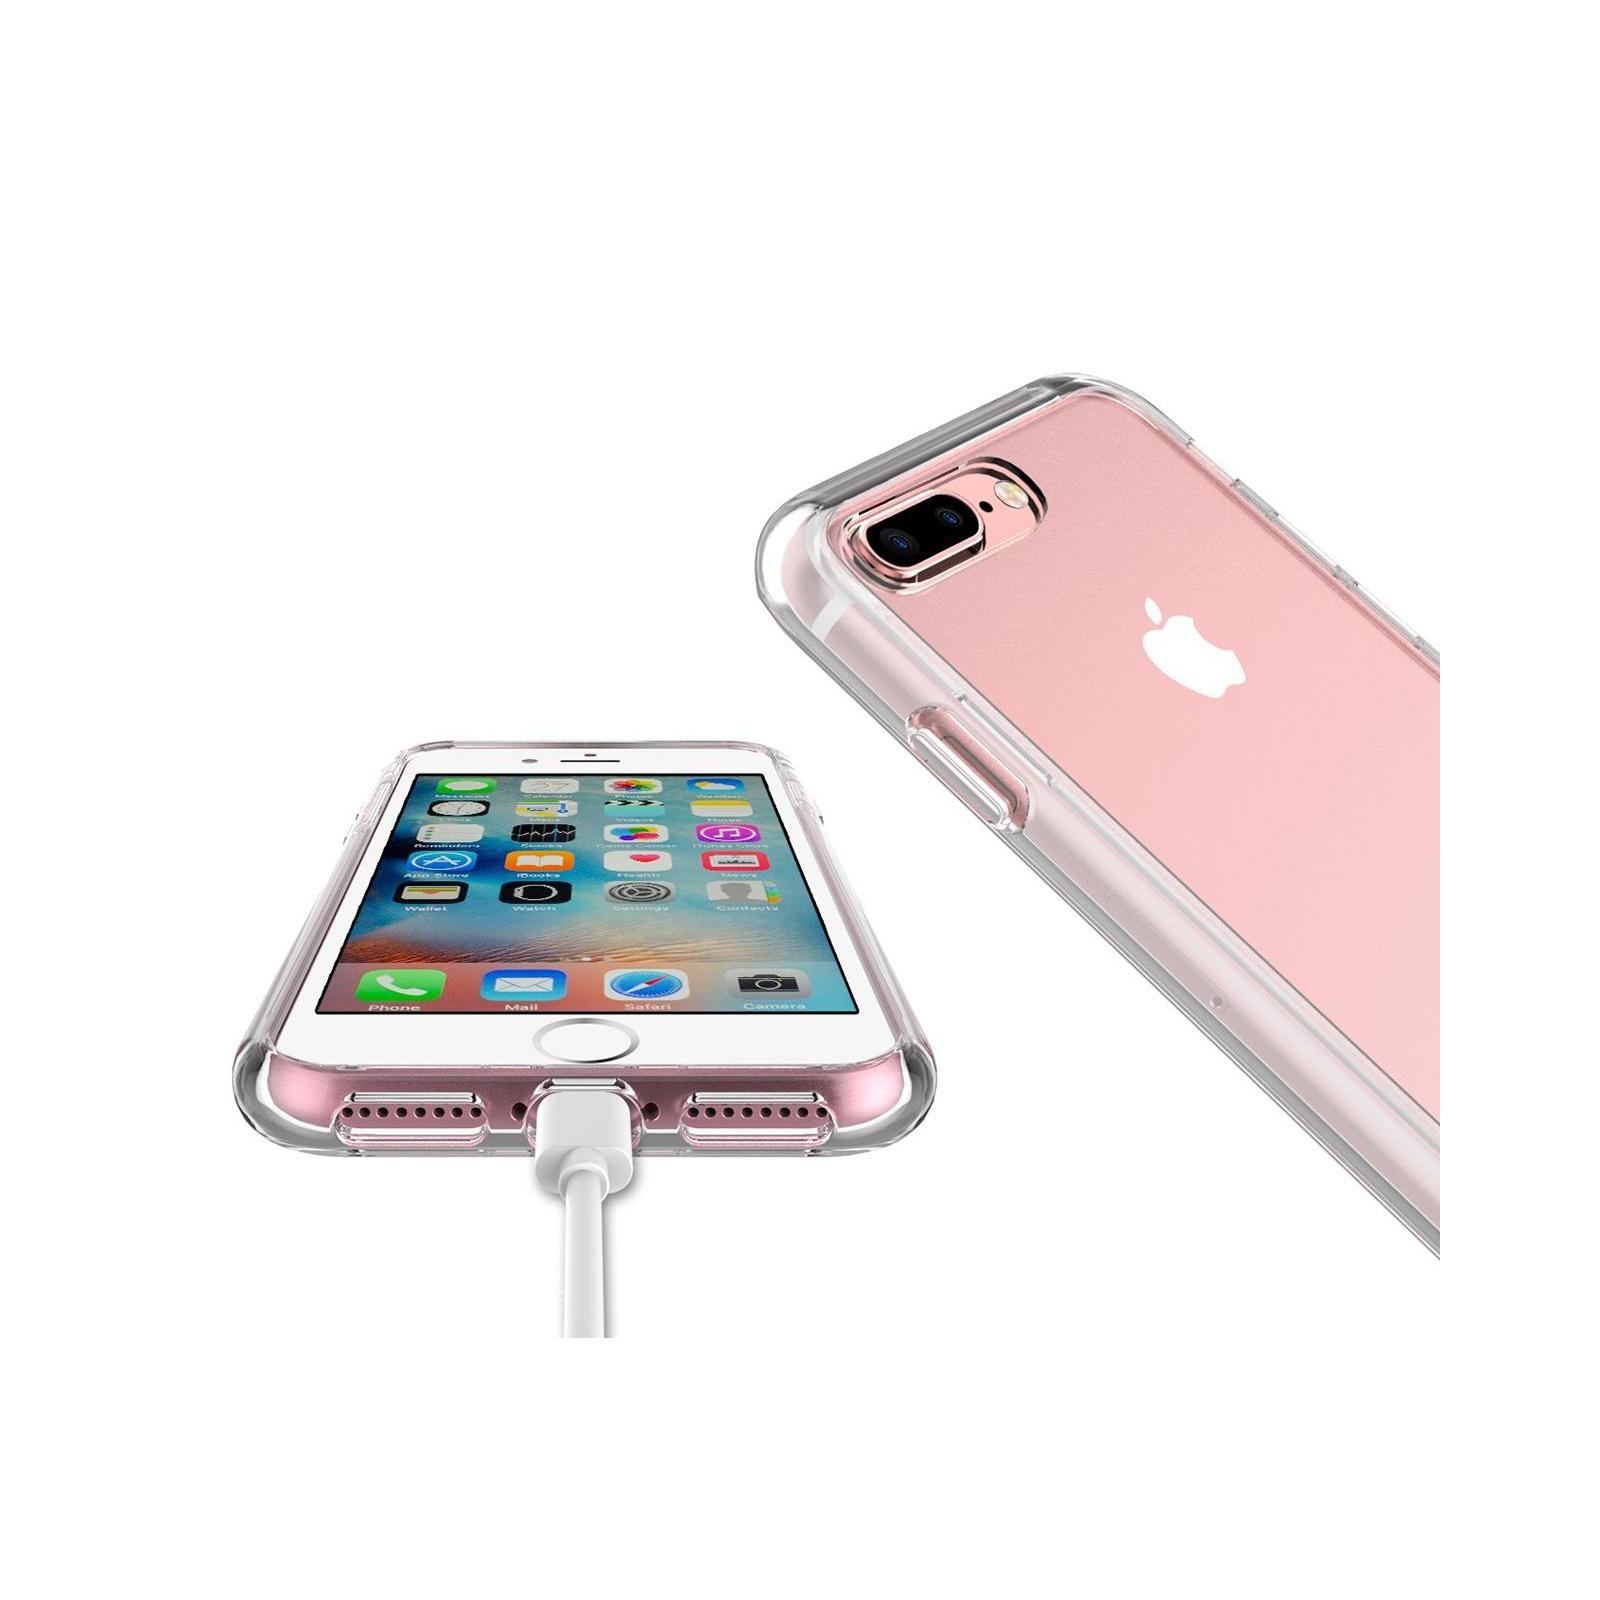 Чехол для моб. телефона Laudtec для iPhone 7/8 Plus Clear tpu (Transperent) (LC-IP78PST) изображение 7